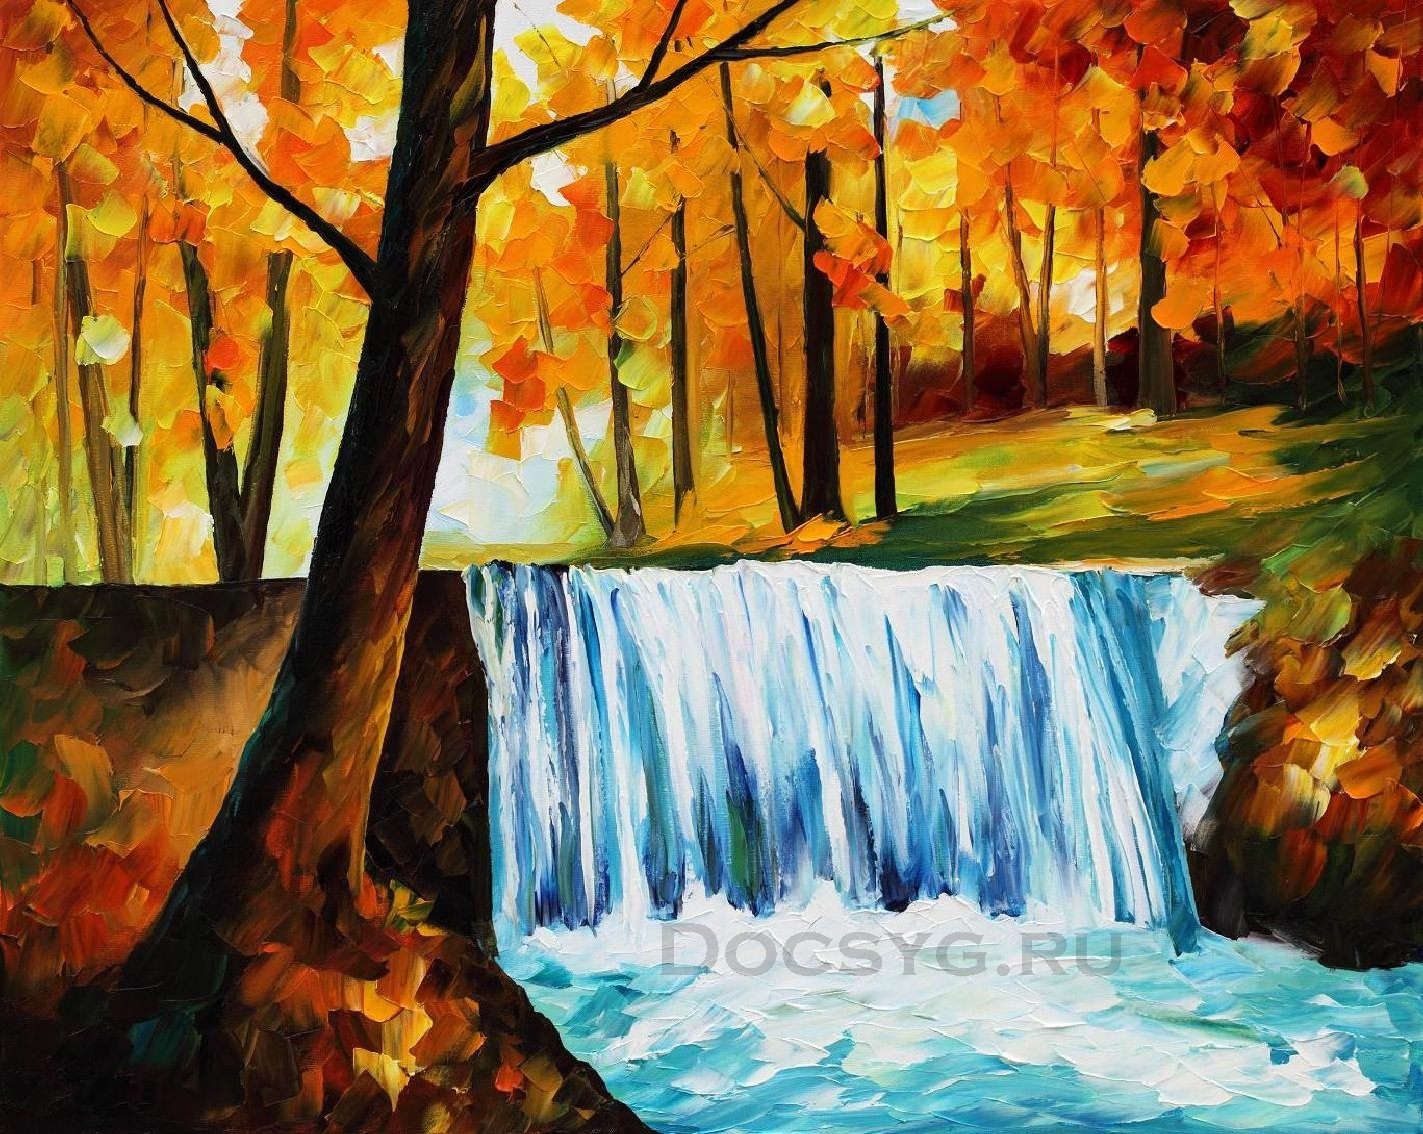 схема вышивки лесной водопад